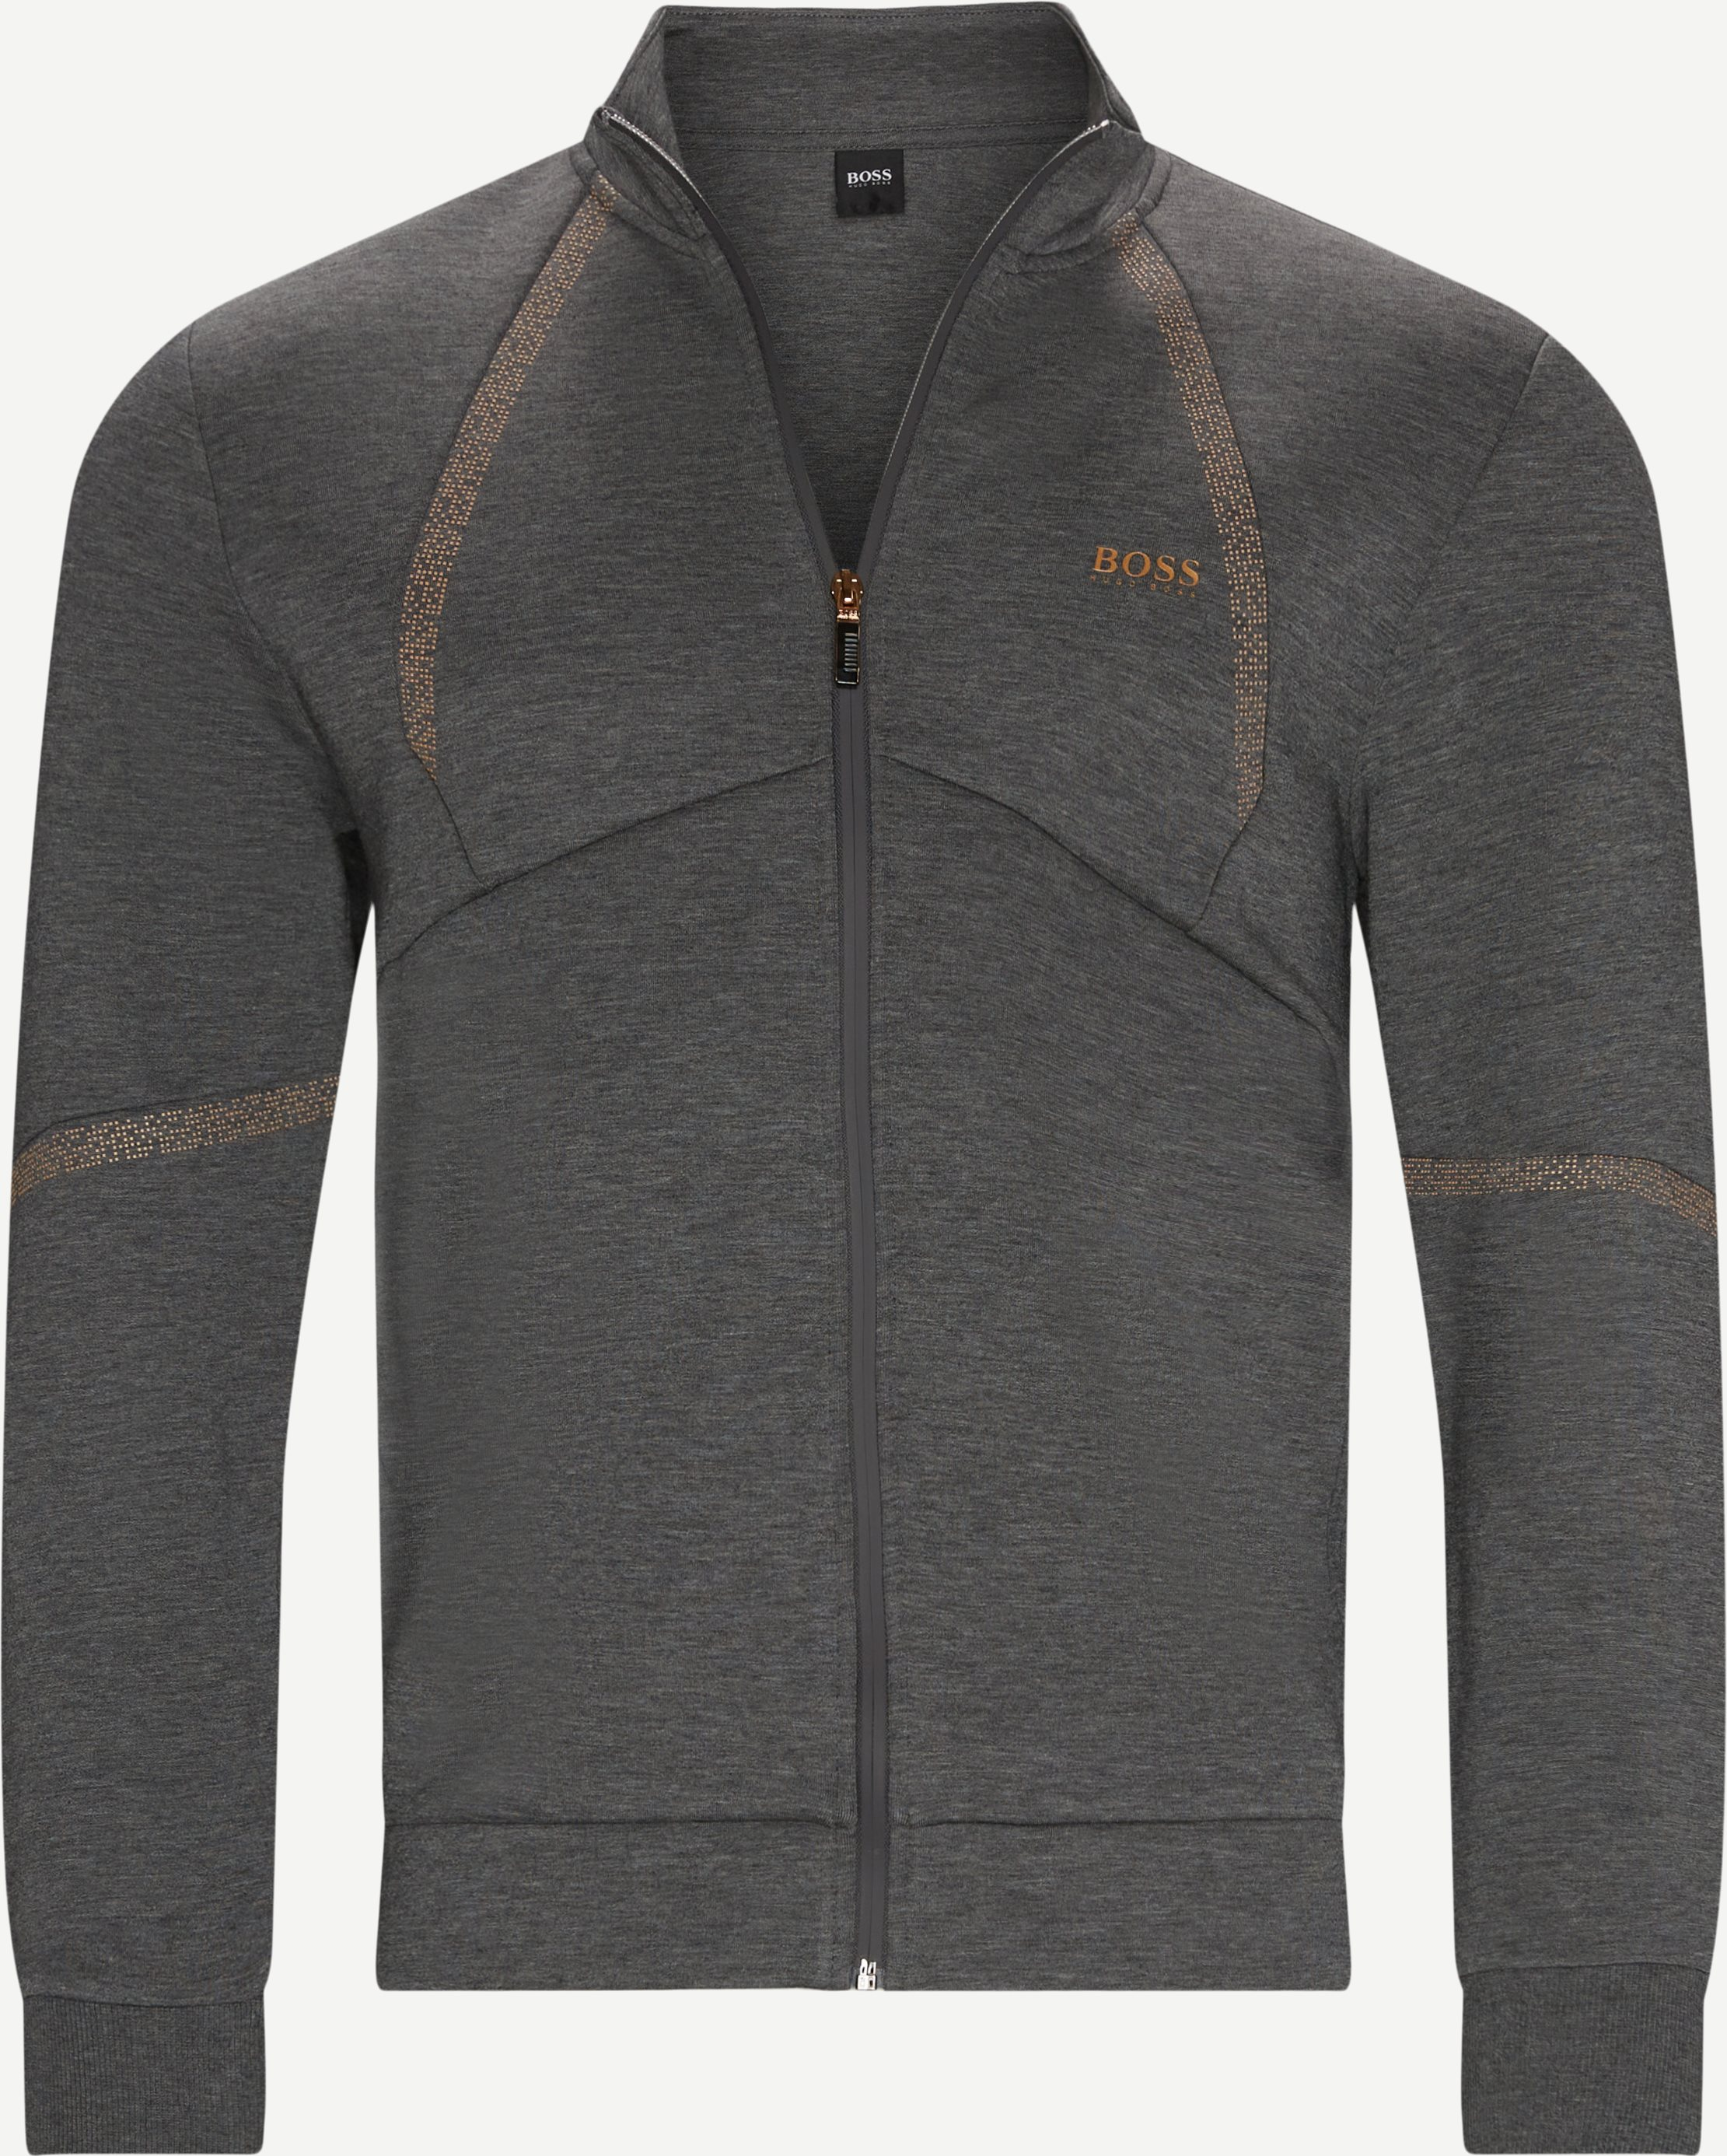 Sweatshirts - Regular fit - Grau